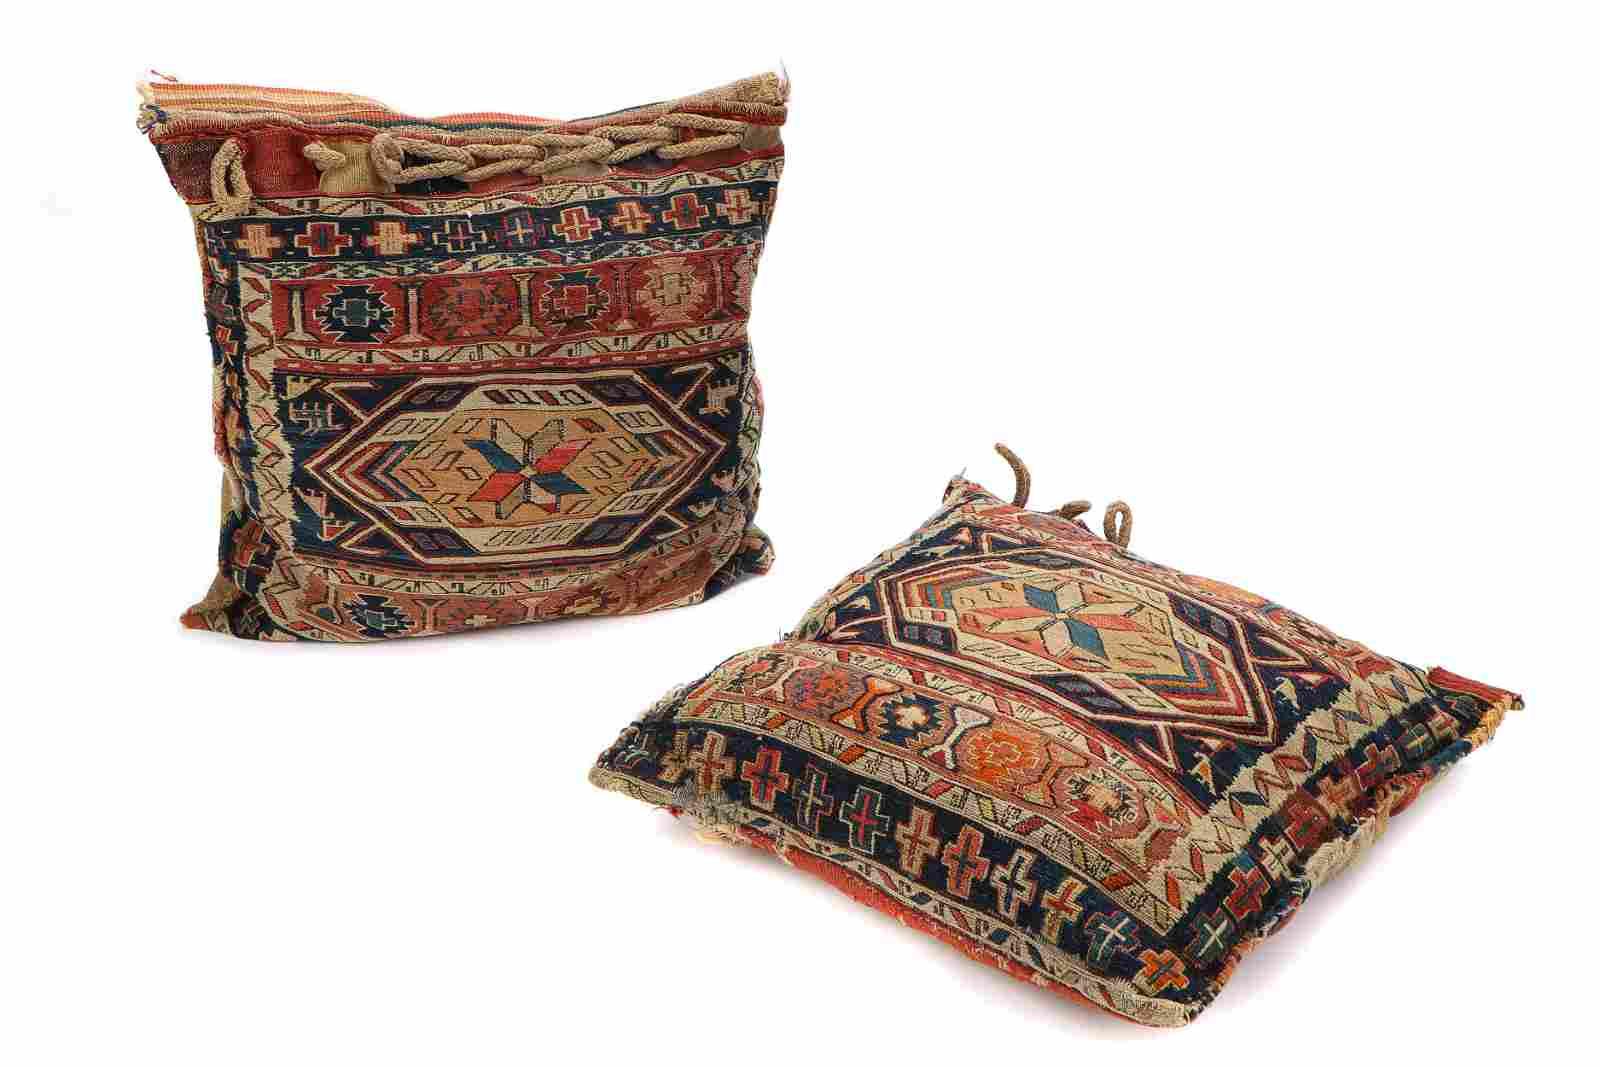 Pair of Antique Caucasian Sumak Saddle Bag Pillows